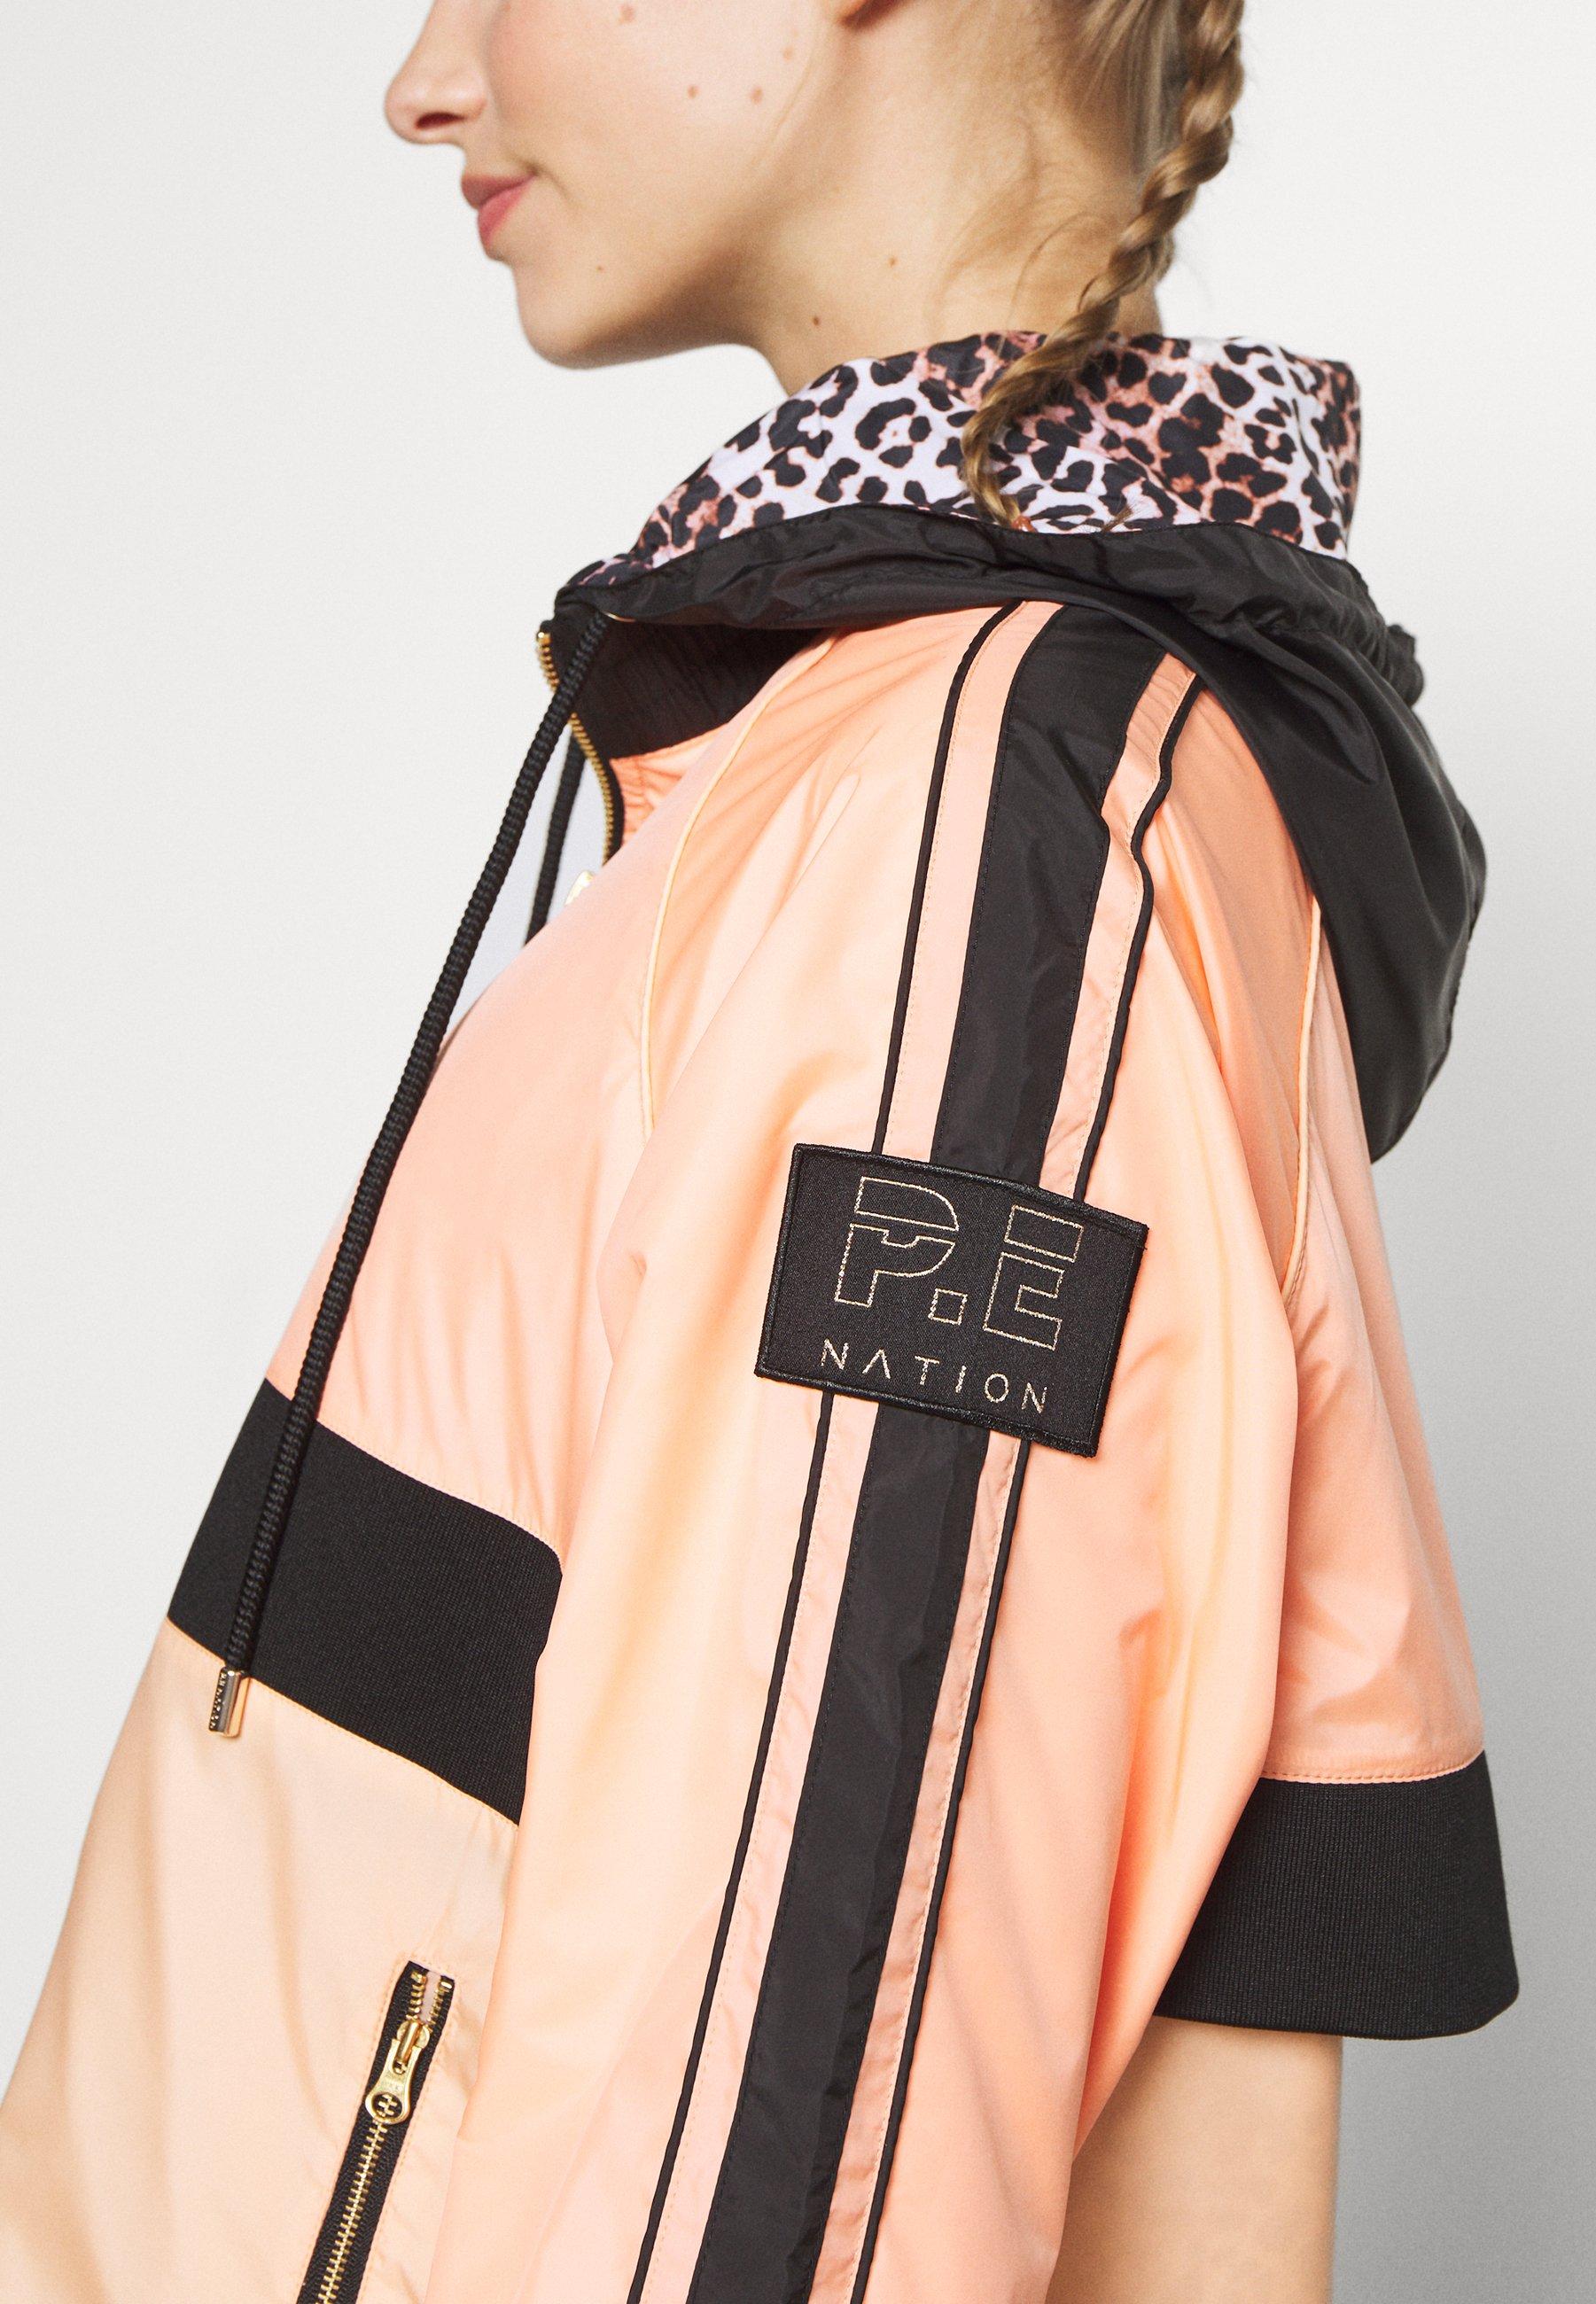 P.E Nation MAN DOWN JACKET - Training jacket - poppy peach SG7Ju